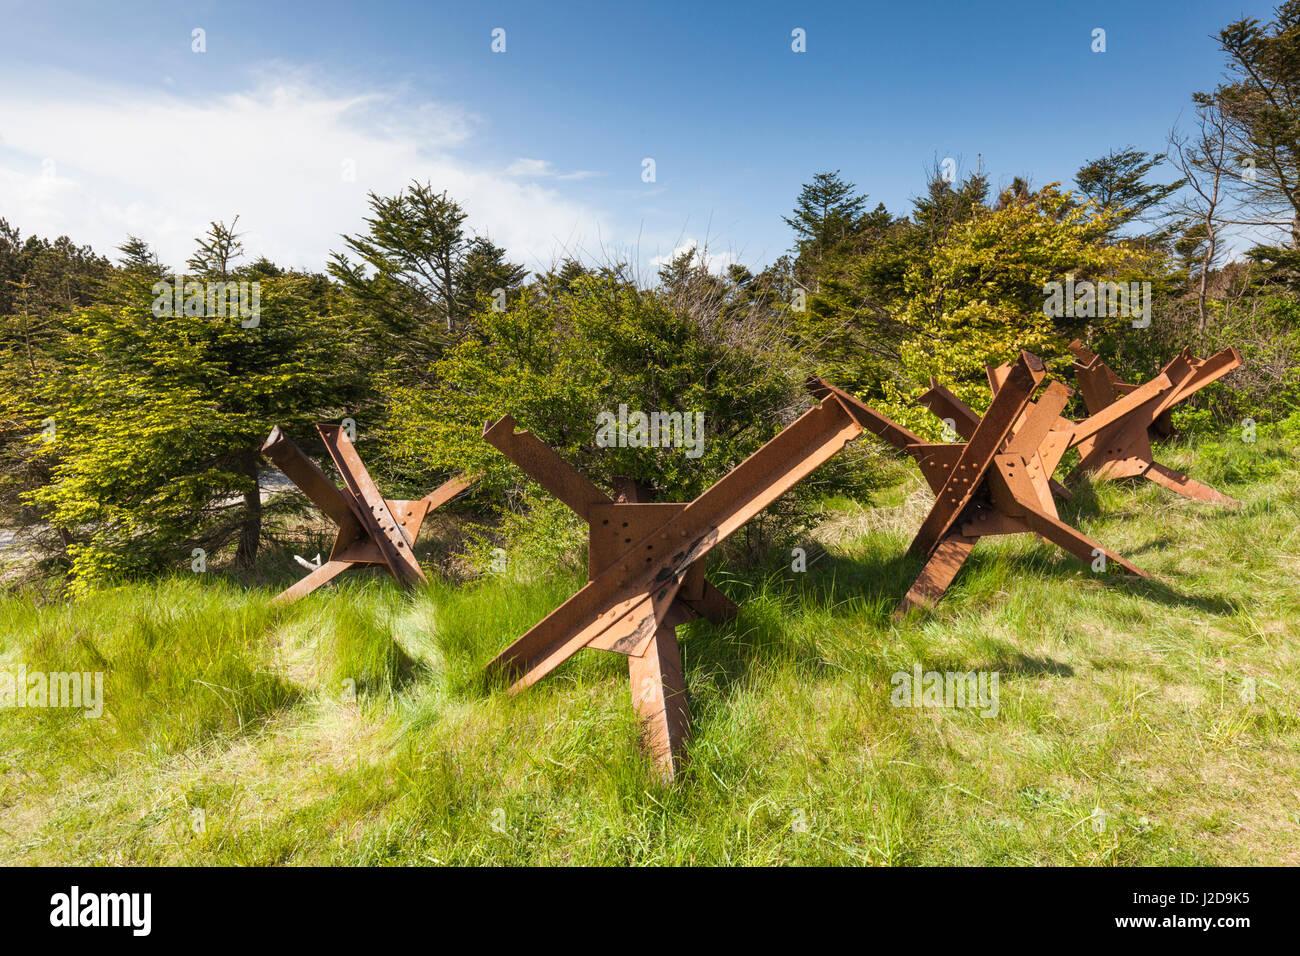 Denmark, Jutland, Hantsholm, WW2-era former German barricades - Stock Image